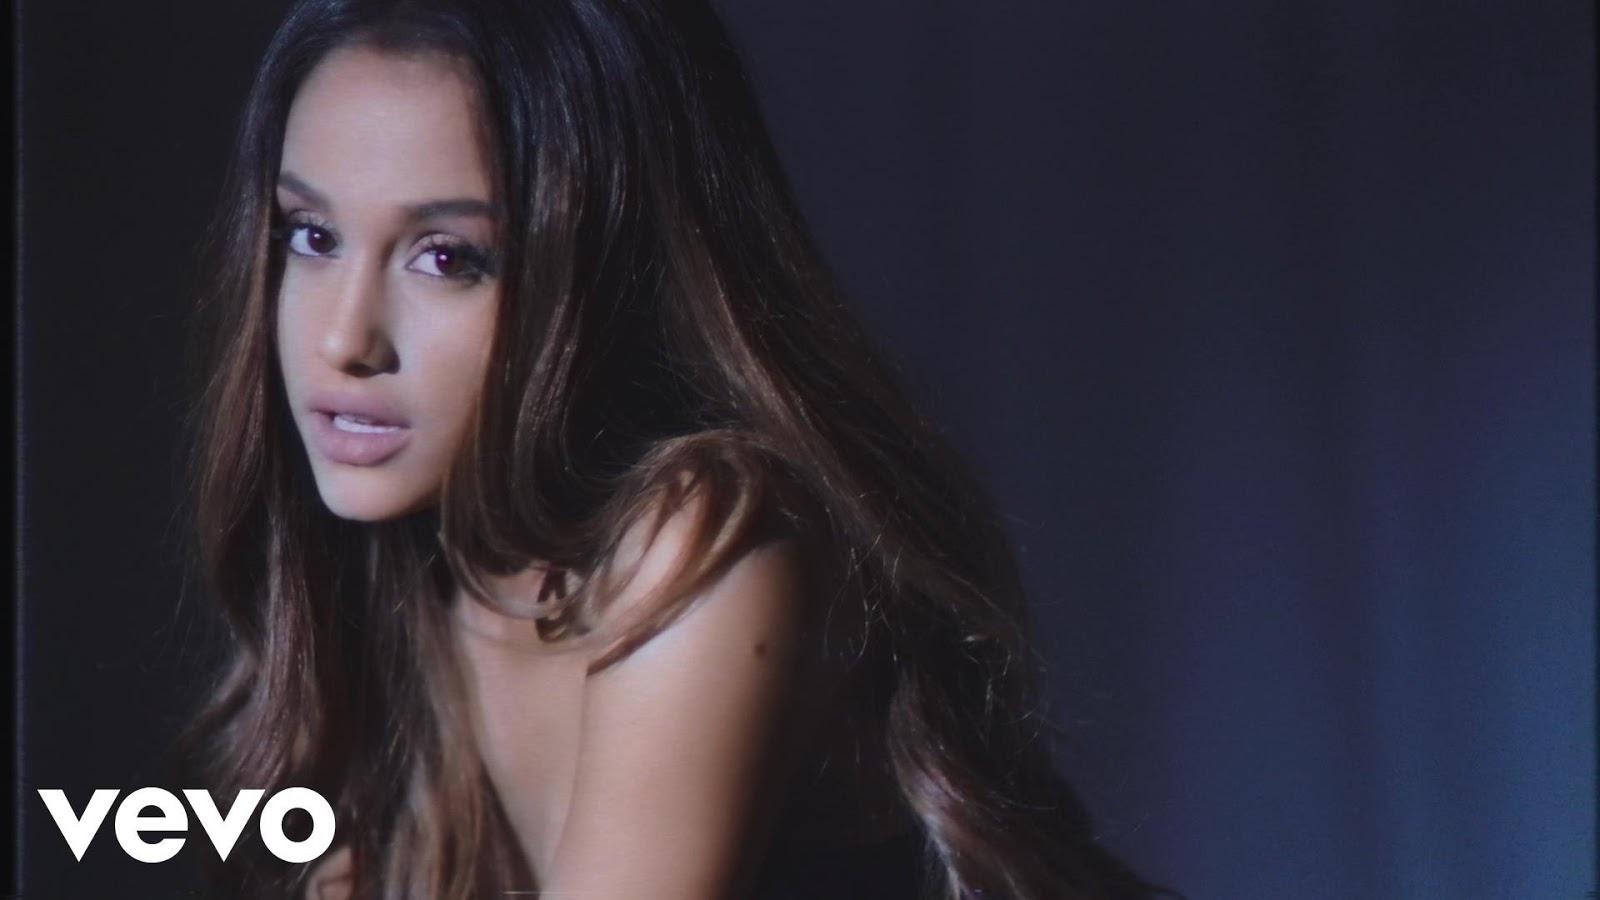 Ariana Grande Leaked Nude Photos 29